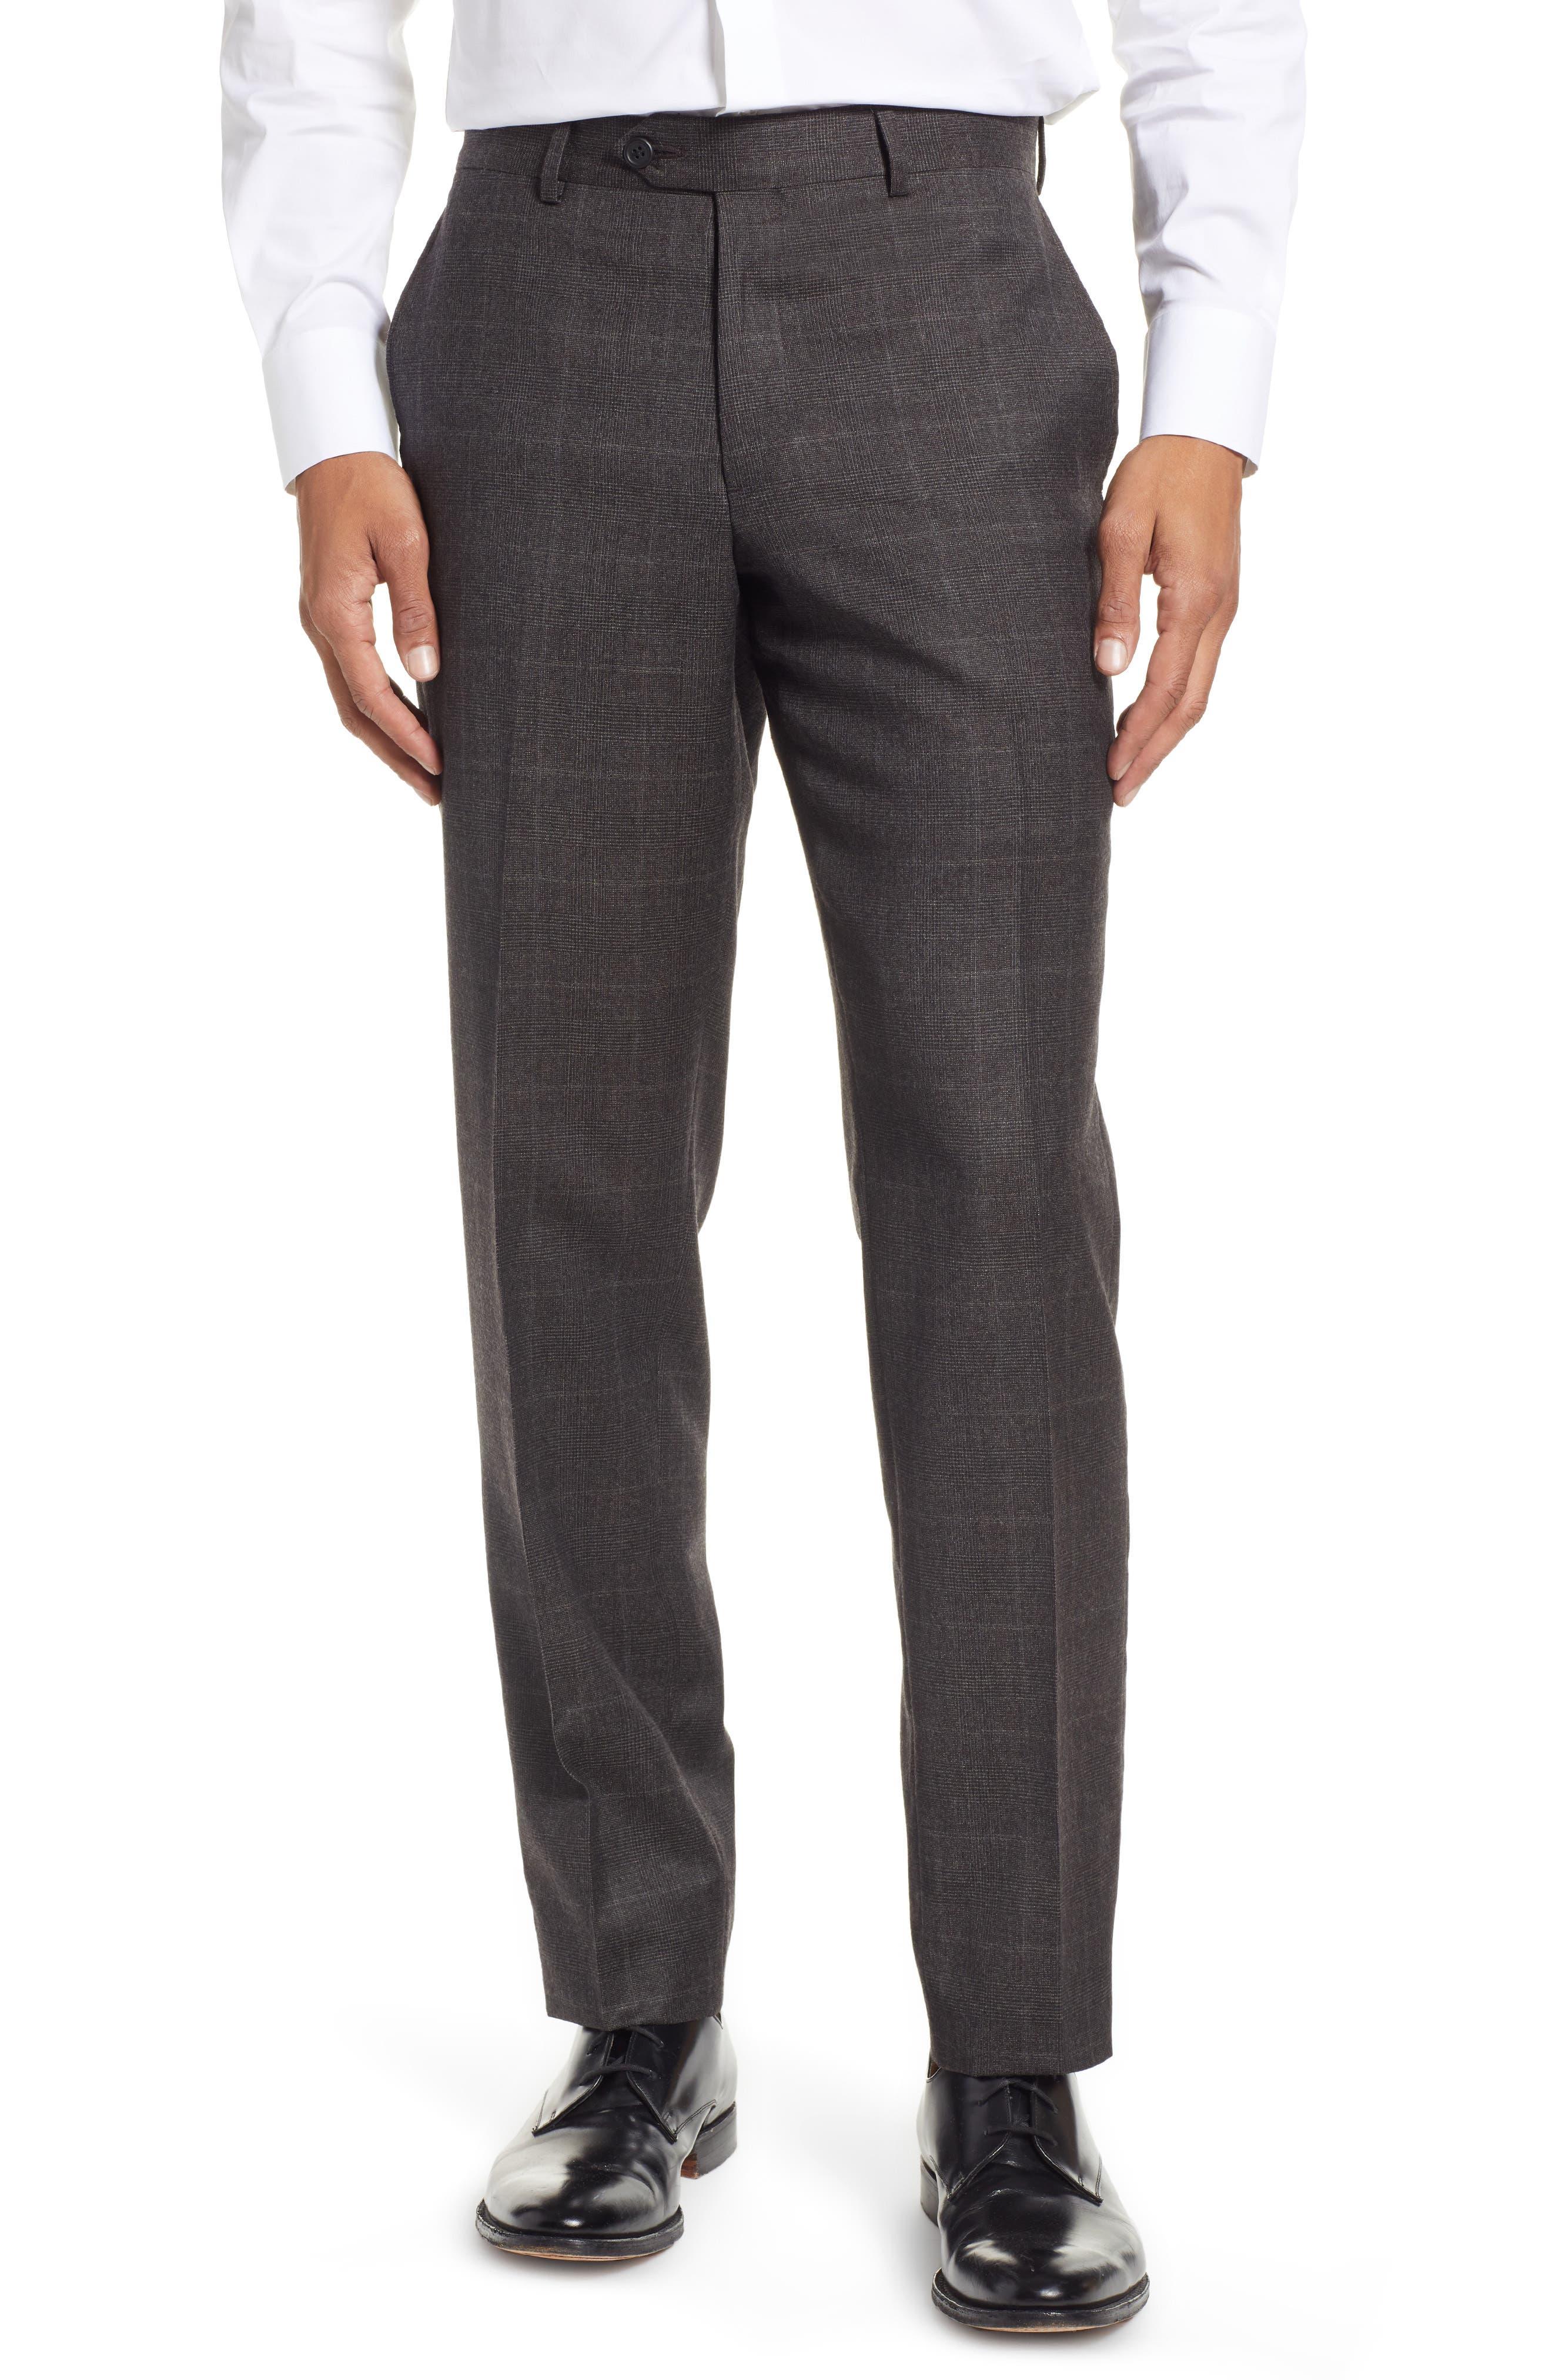 Trim Fit Flat Front Wool Trousers,                             Main thumbnail 1, color,                             BLACK